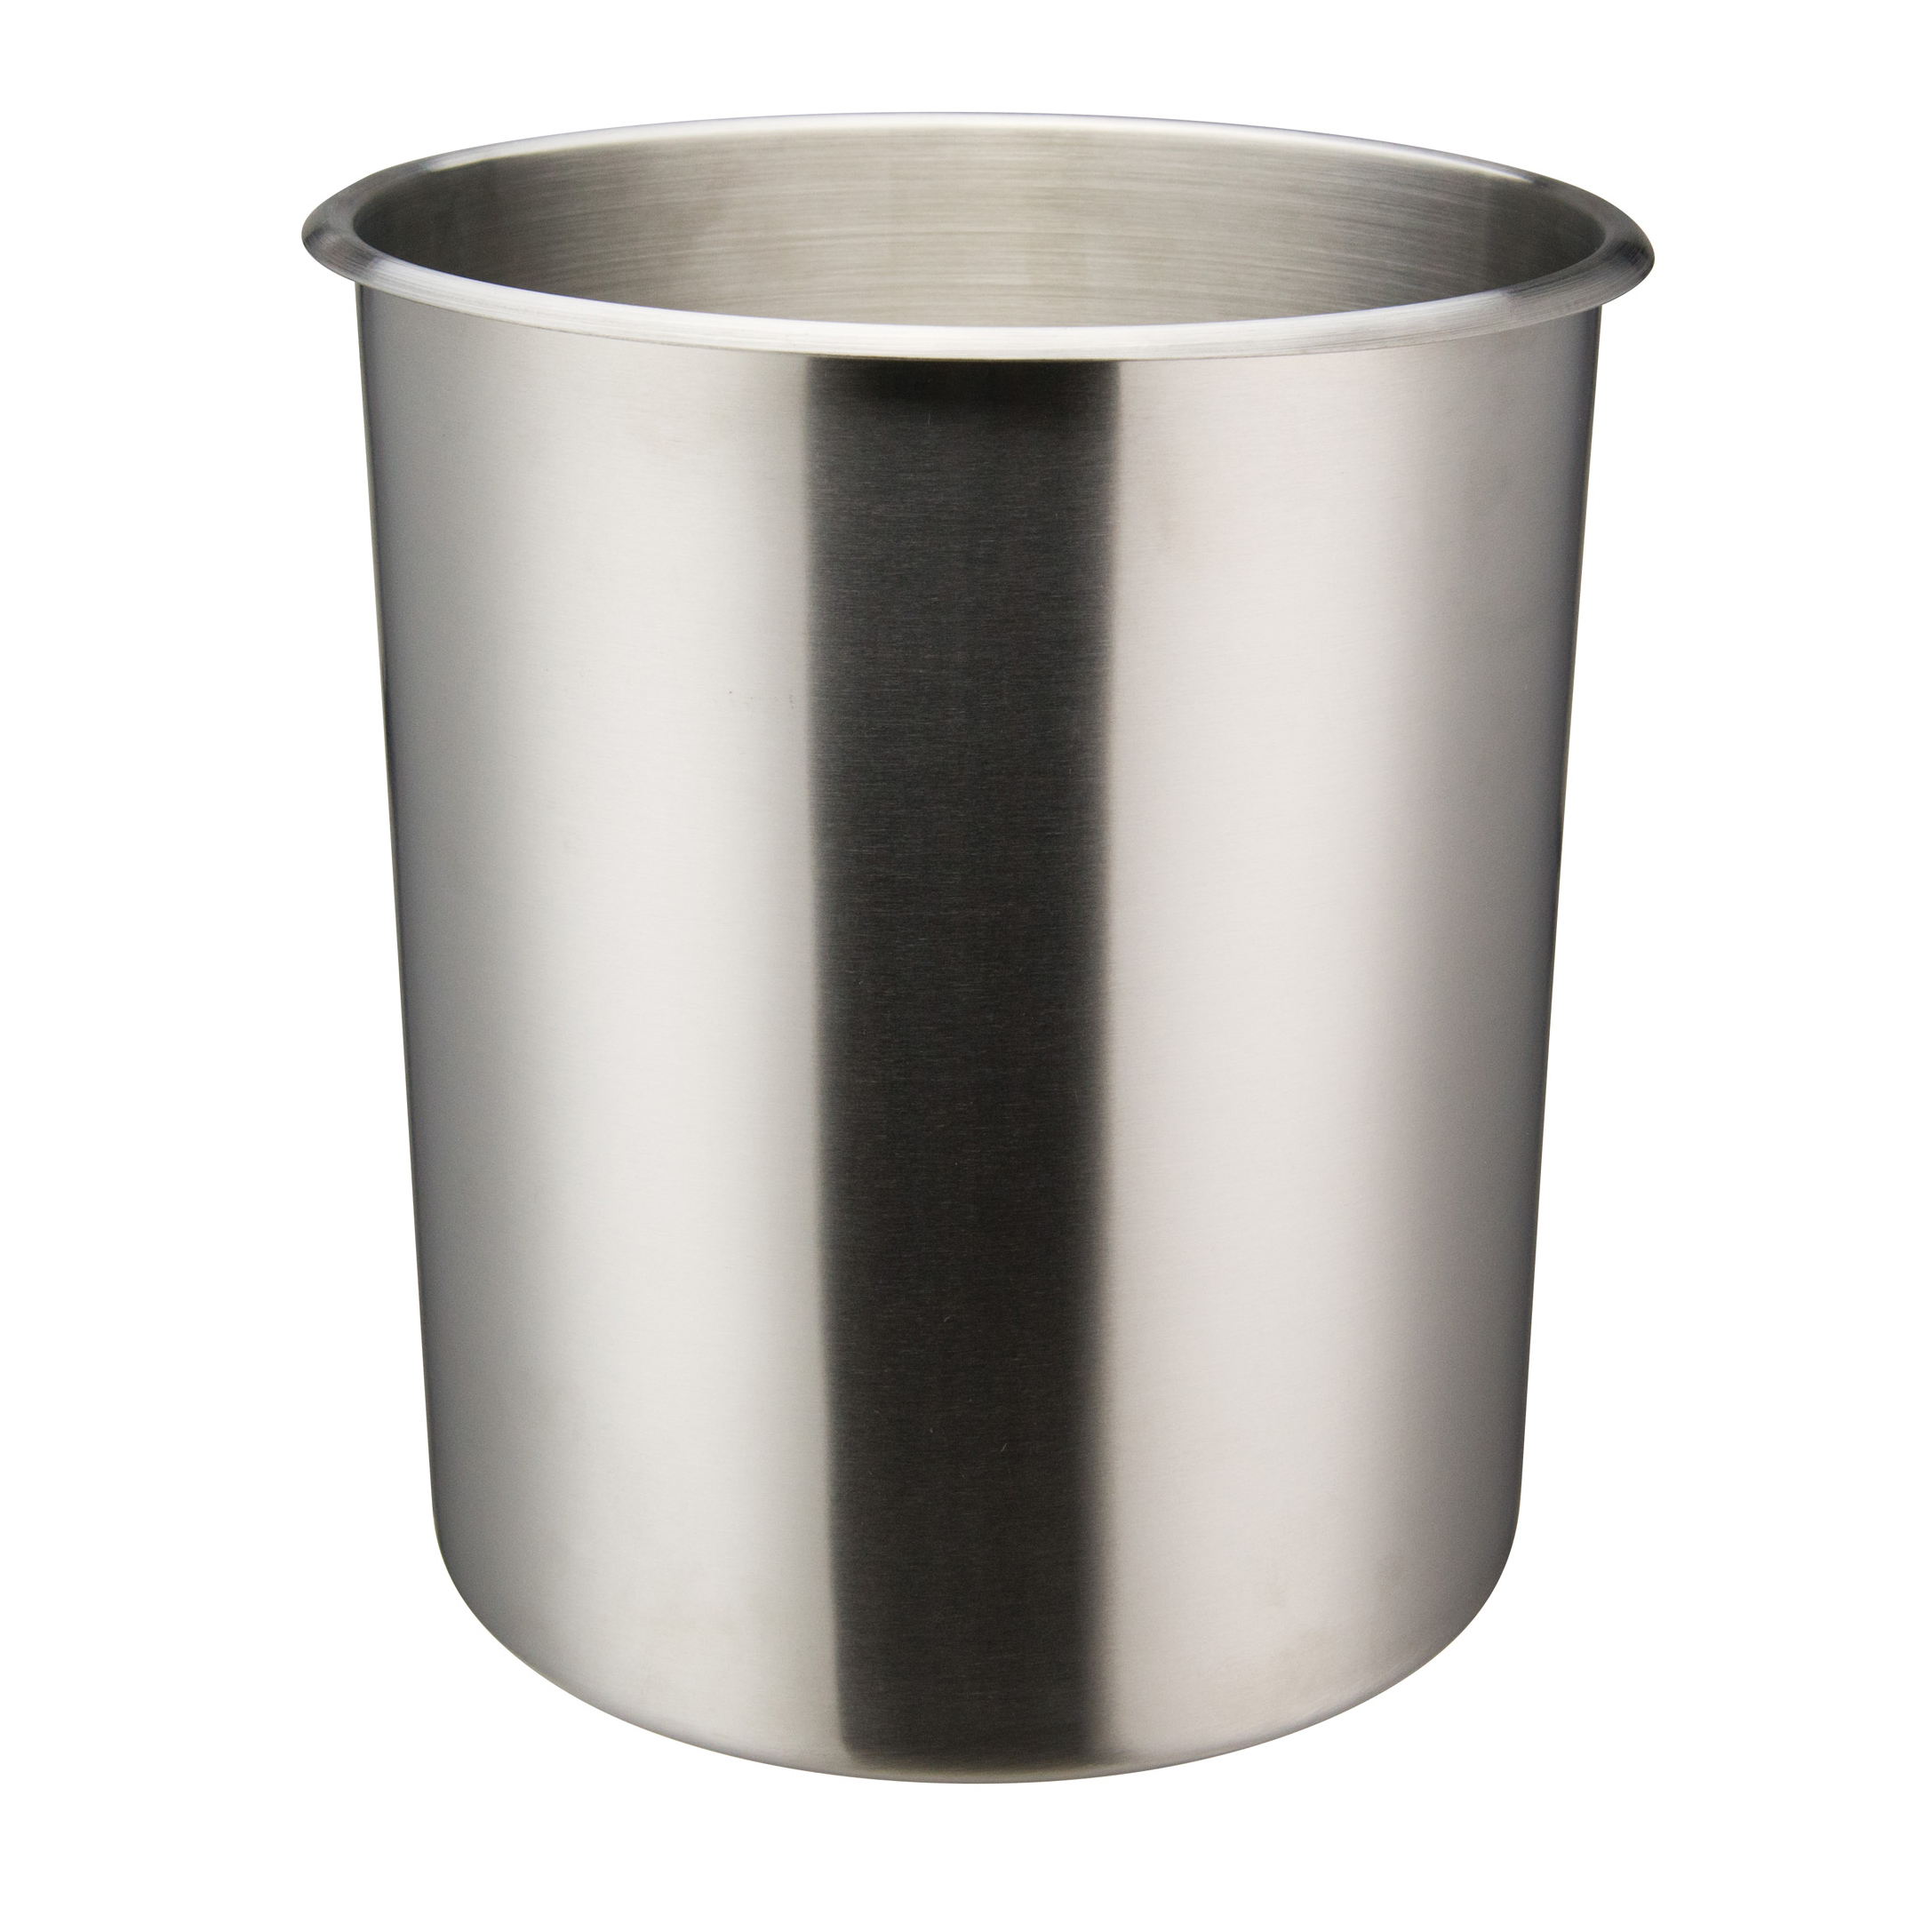 Winco BAM-12 bain marie pot